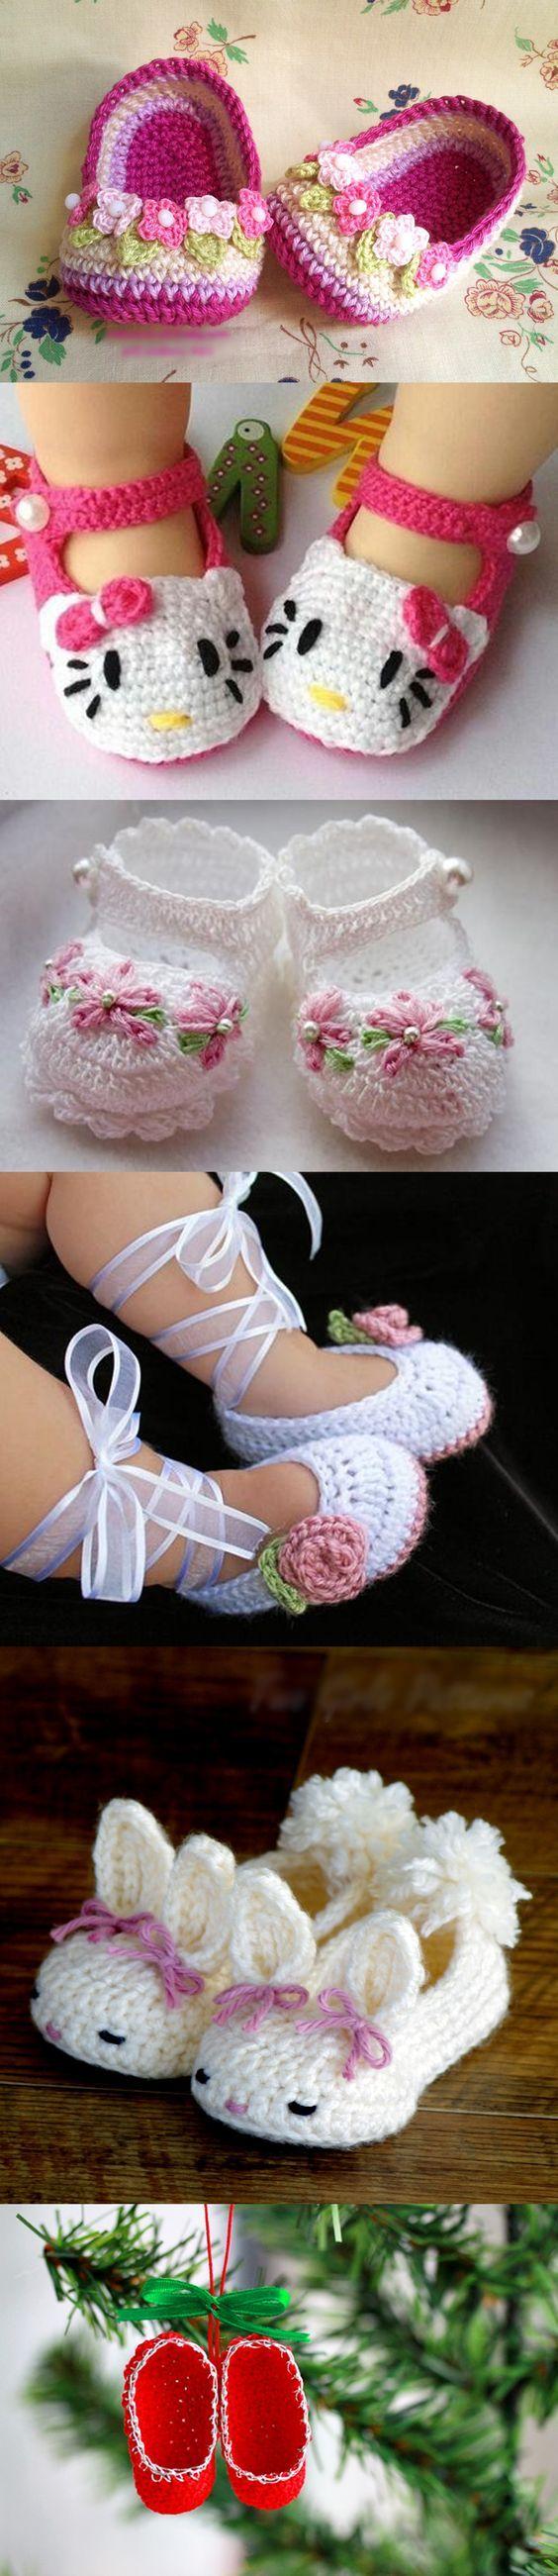 Wonderful DIY Mini Crochet Slippers | WonderfulDIY.com: